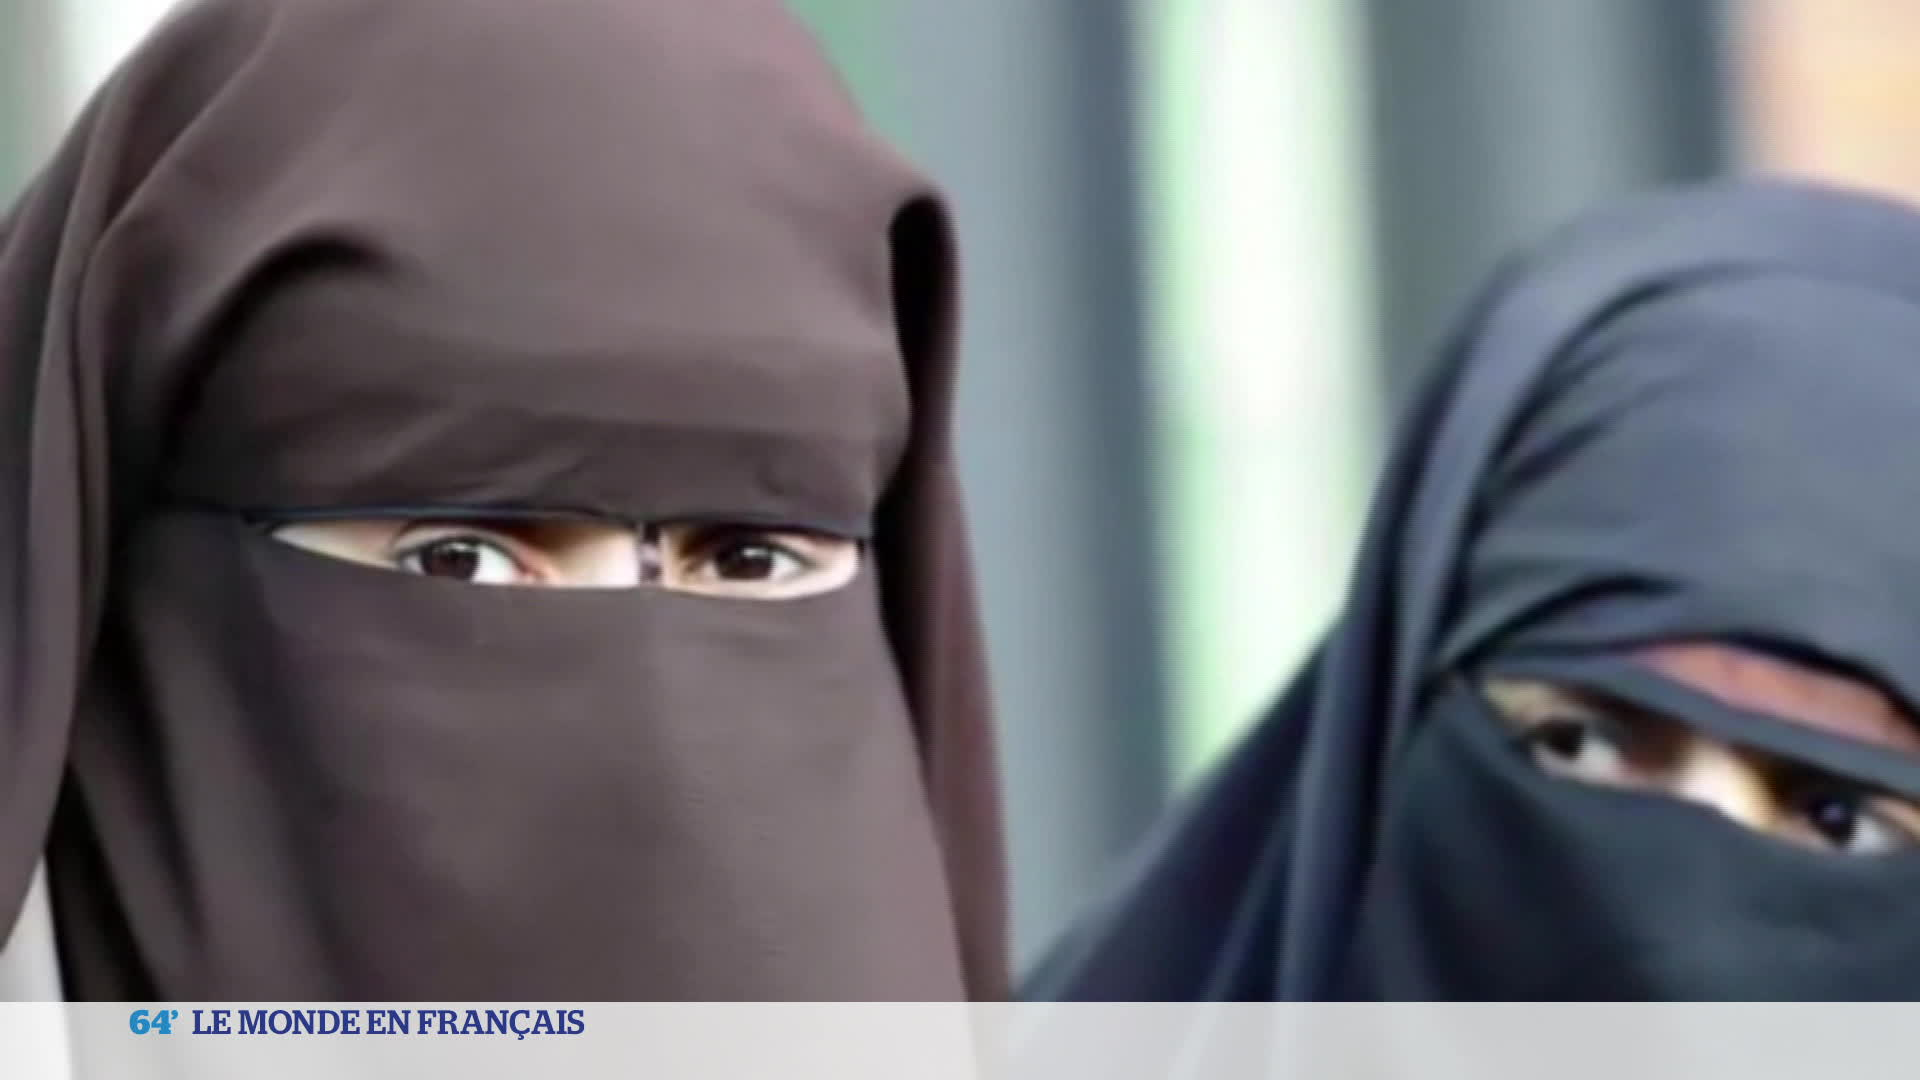 Le royaume marocain interdit niqab et burqa